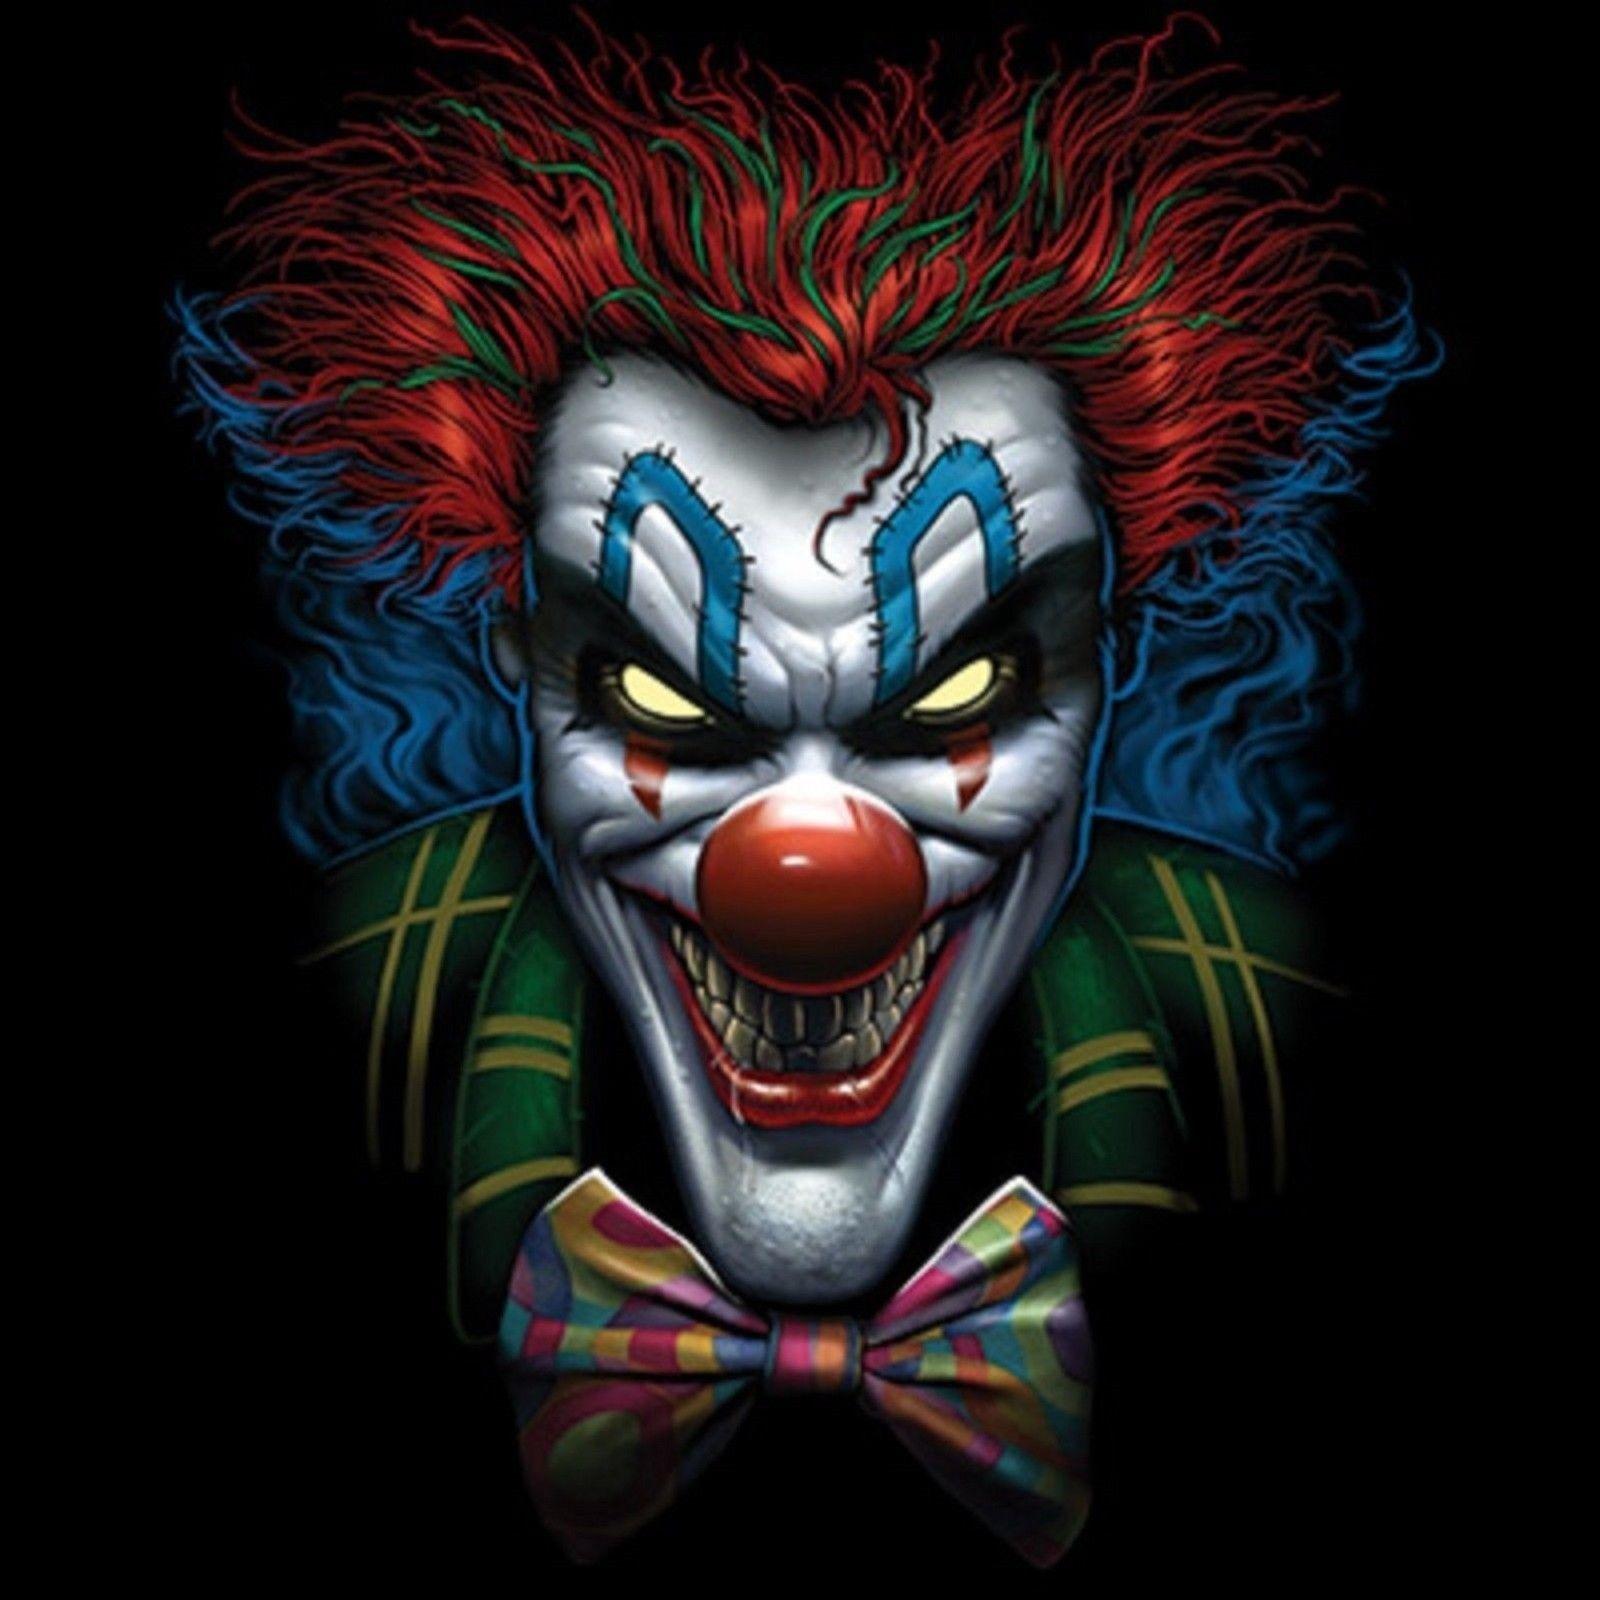 Psyco Clown T Shirt Pick Your Size Youth Medium To 6 X Large Clown Horror Creepy Clown Clown Pics